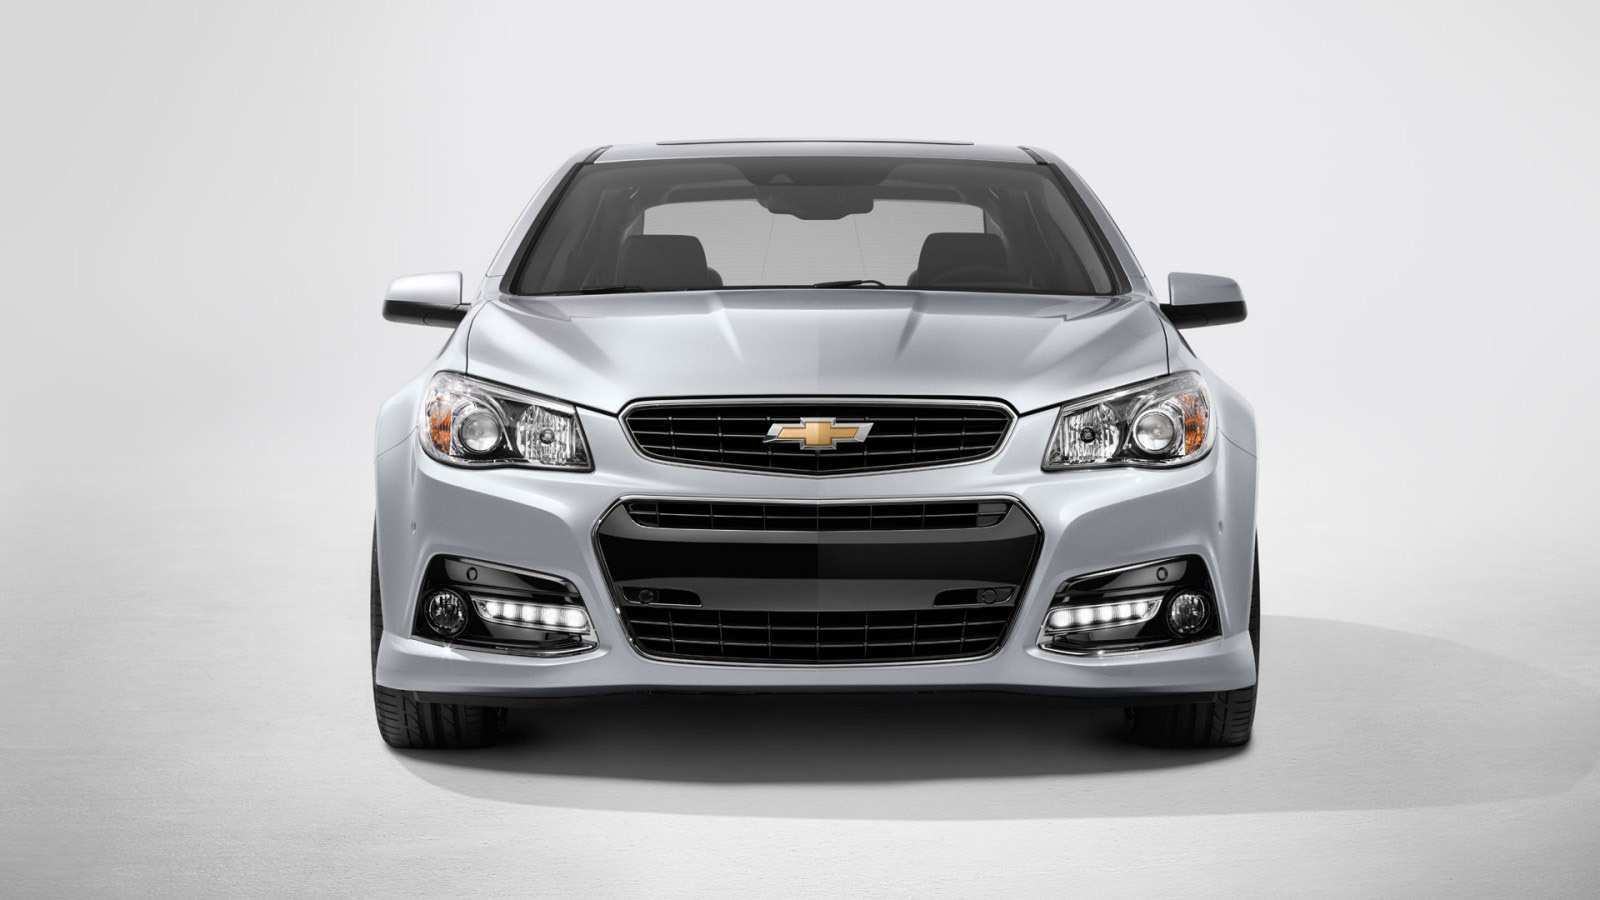 31 Concept of 2020 Pontiac G8 Gt Release Date by 2020 Pontiac G8 Gt